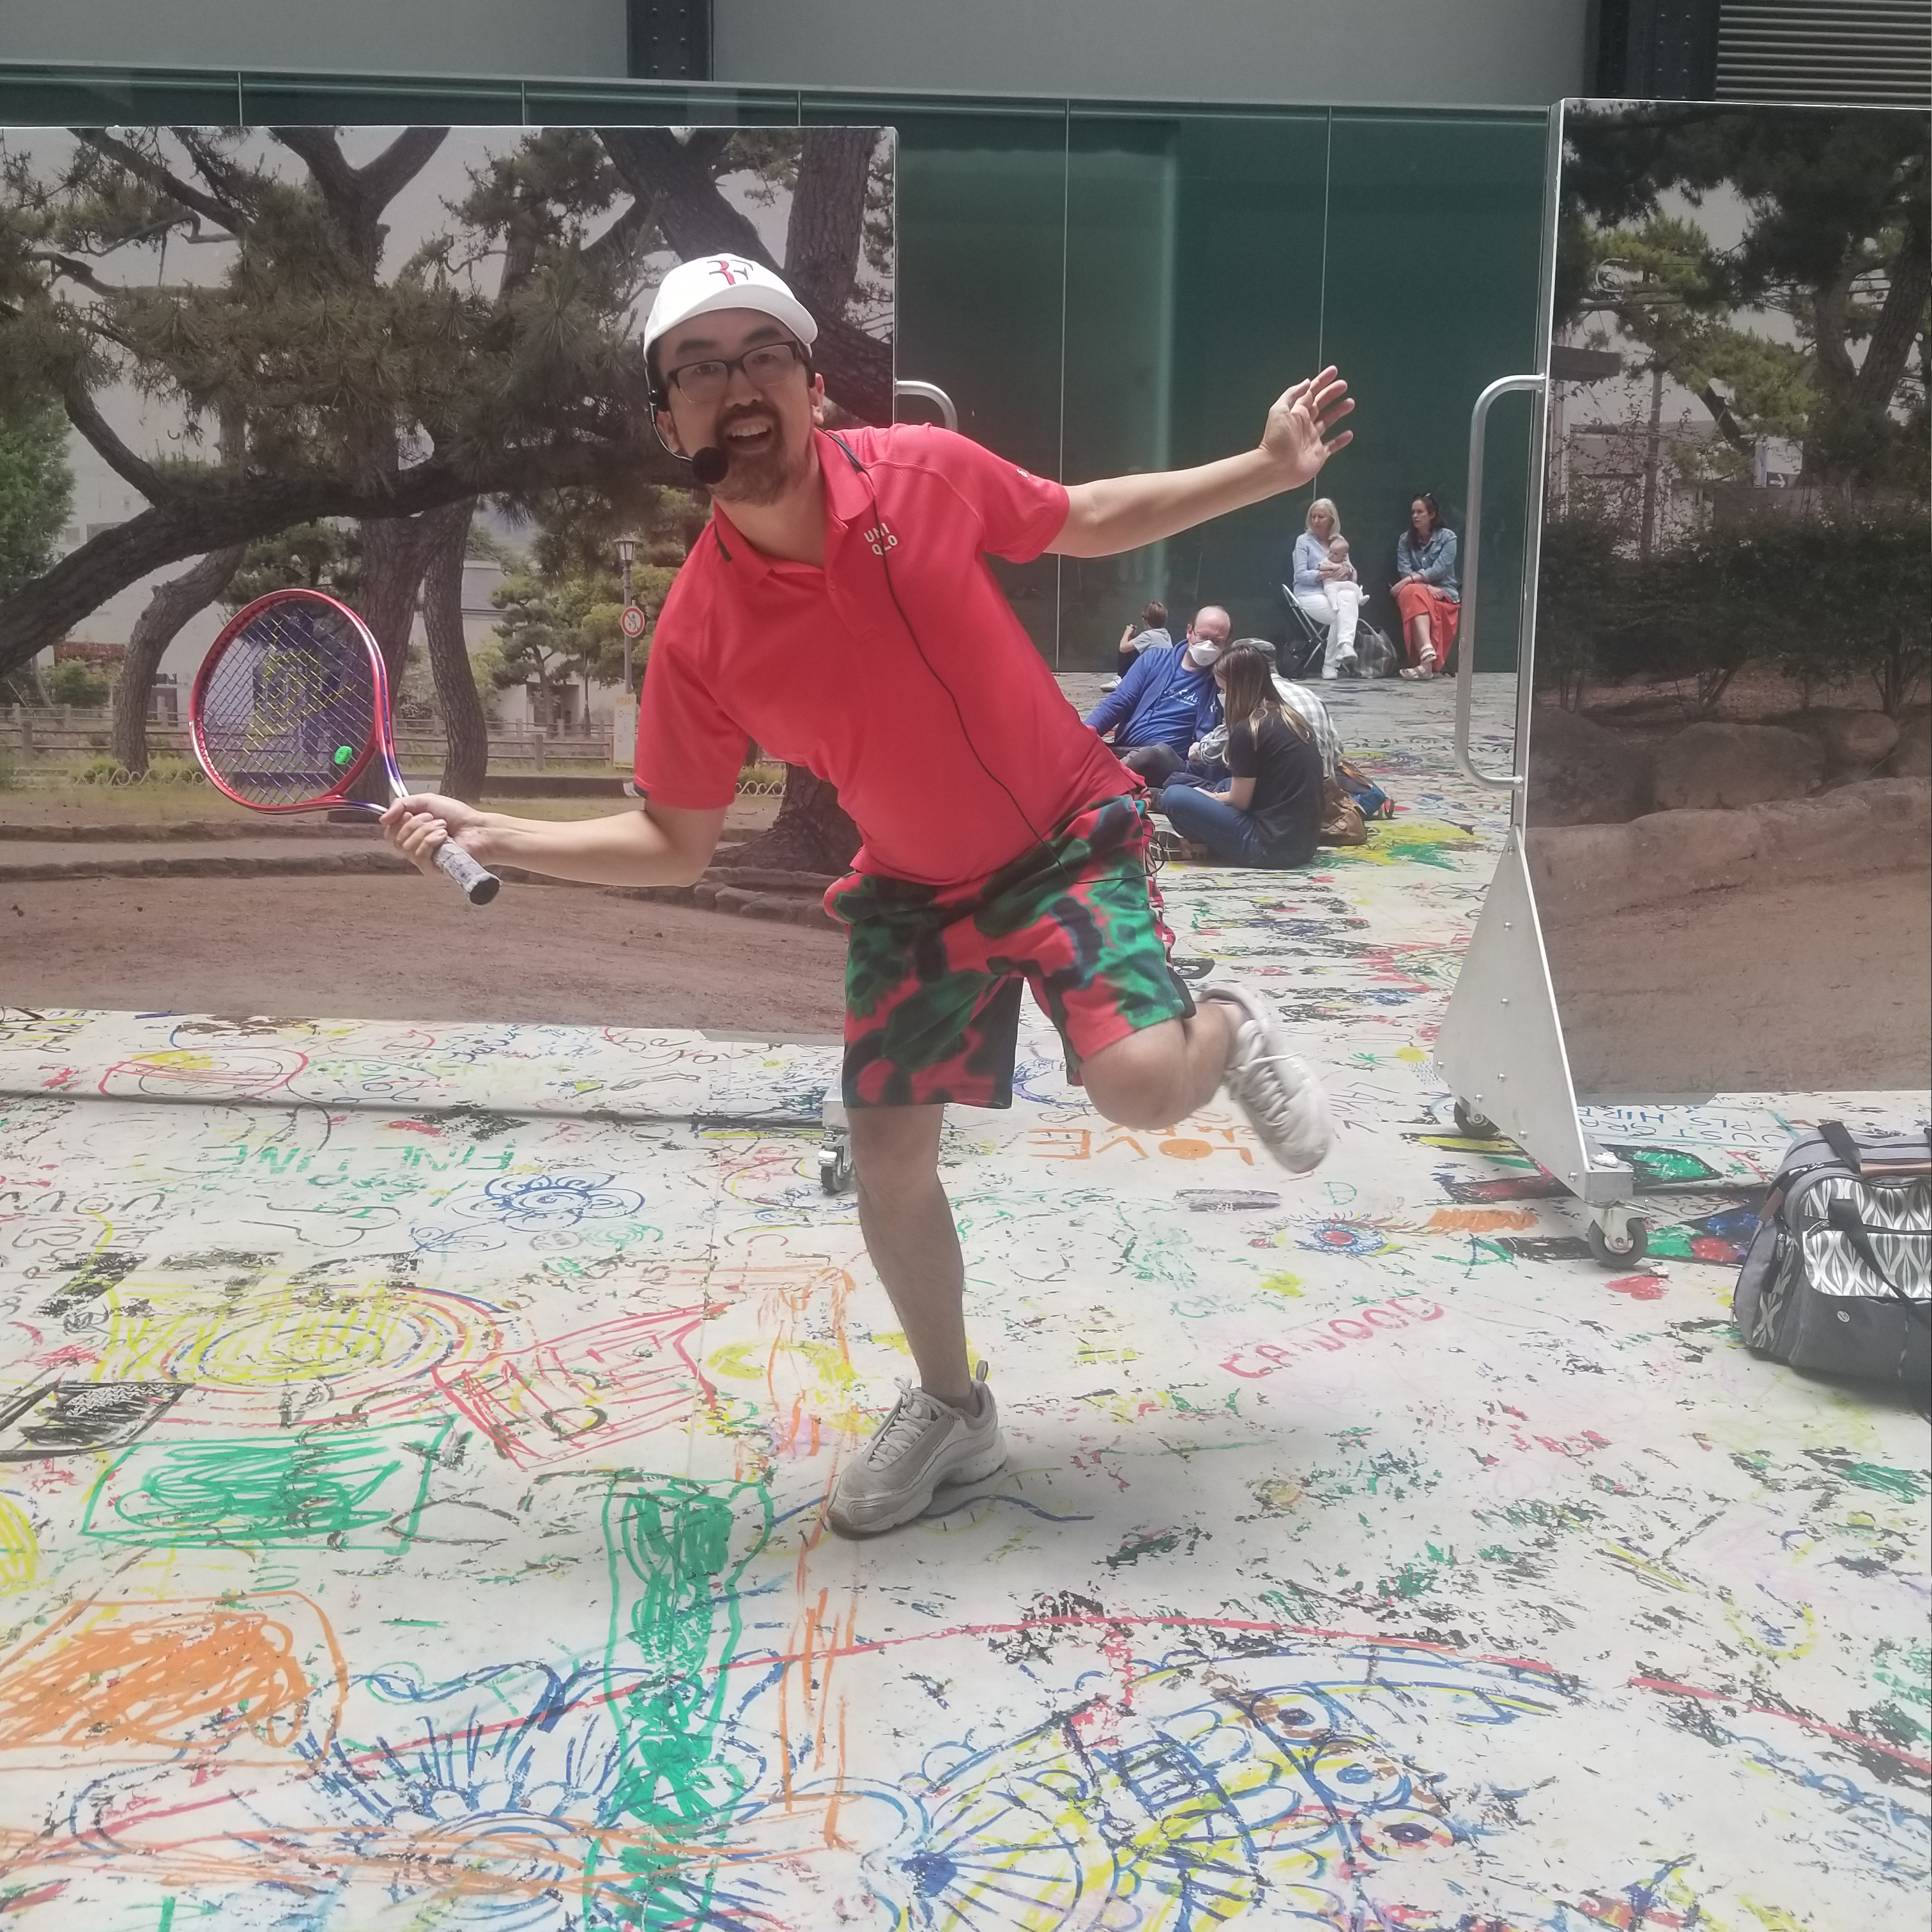 Ei Arakawa performing _Mega Please Draw Freely_ at Tate Modern, summer 2021.